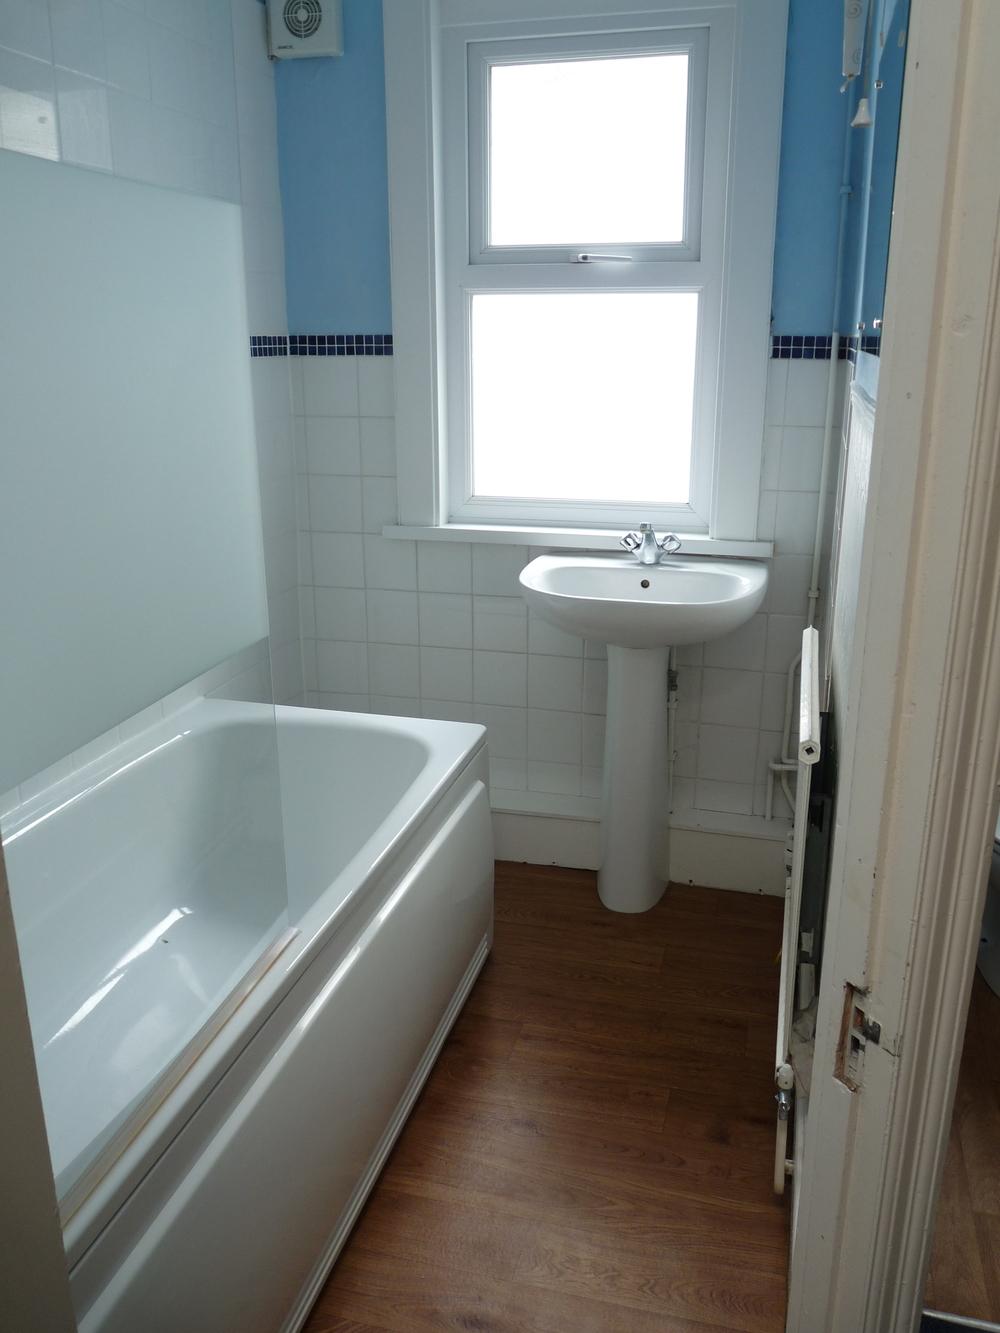 53 Small Bathroom.JPG